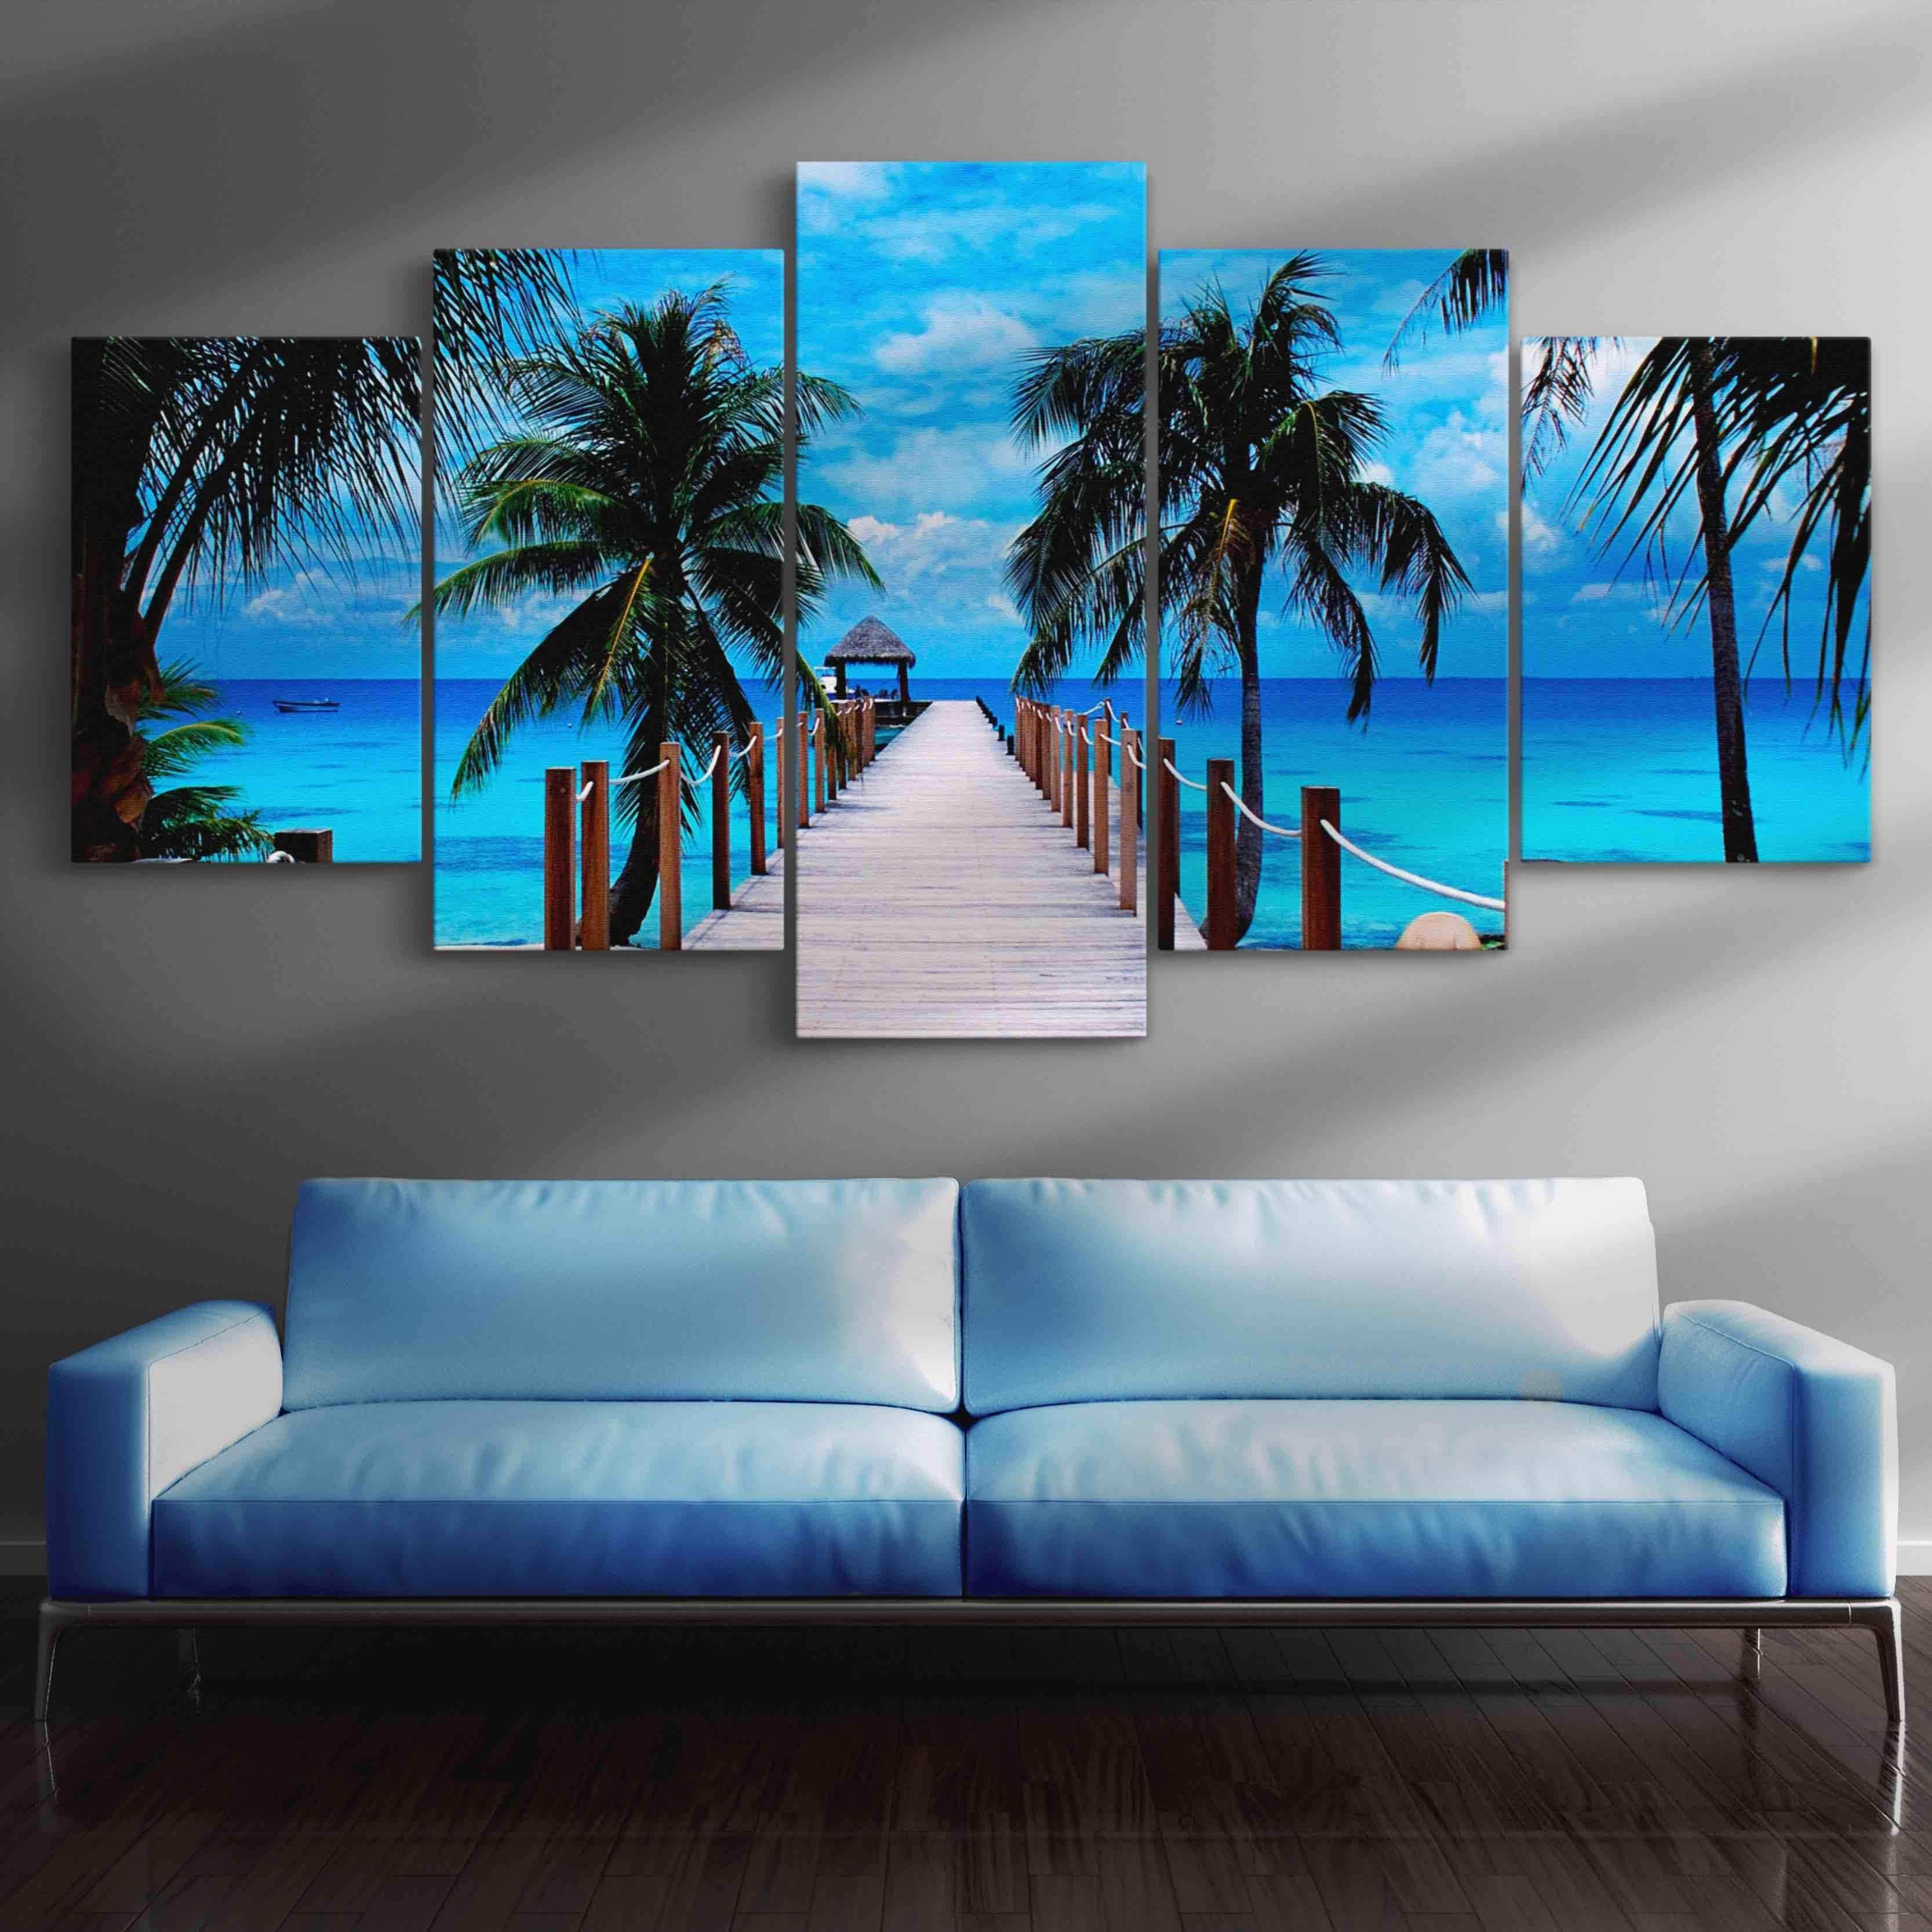 Perfect Vacation 5 panel wall art canvas